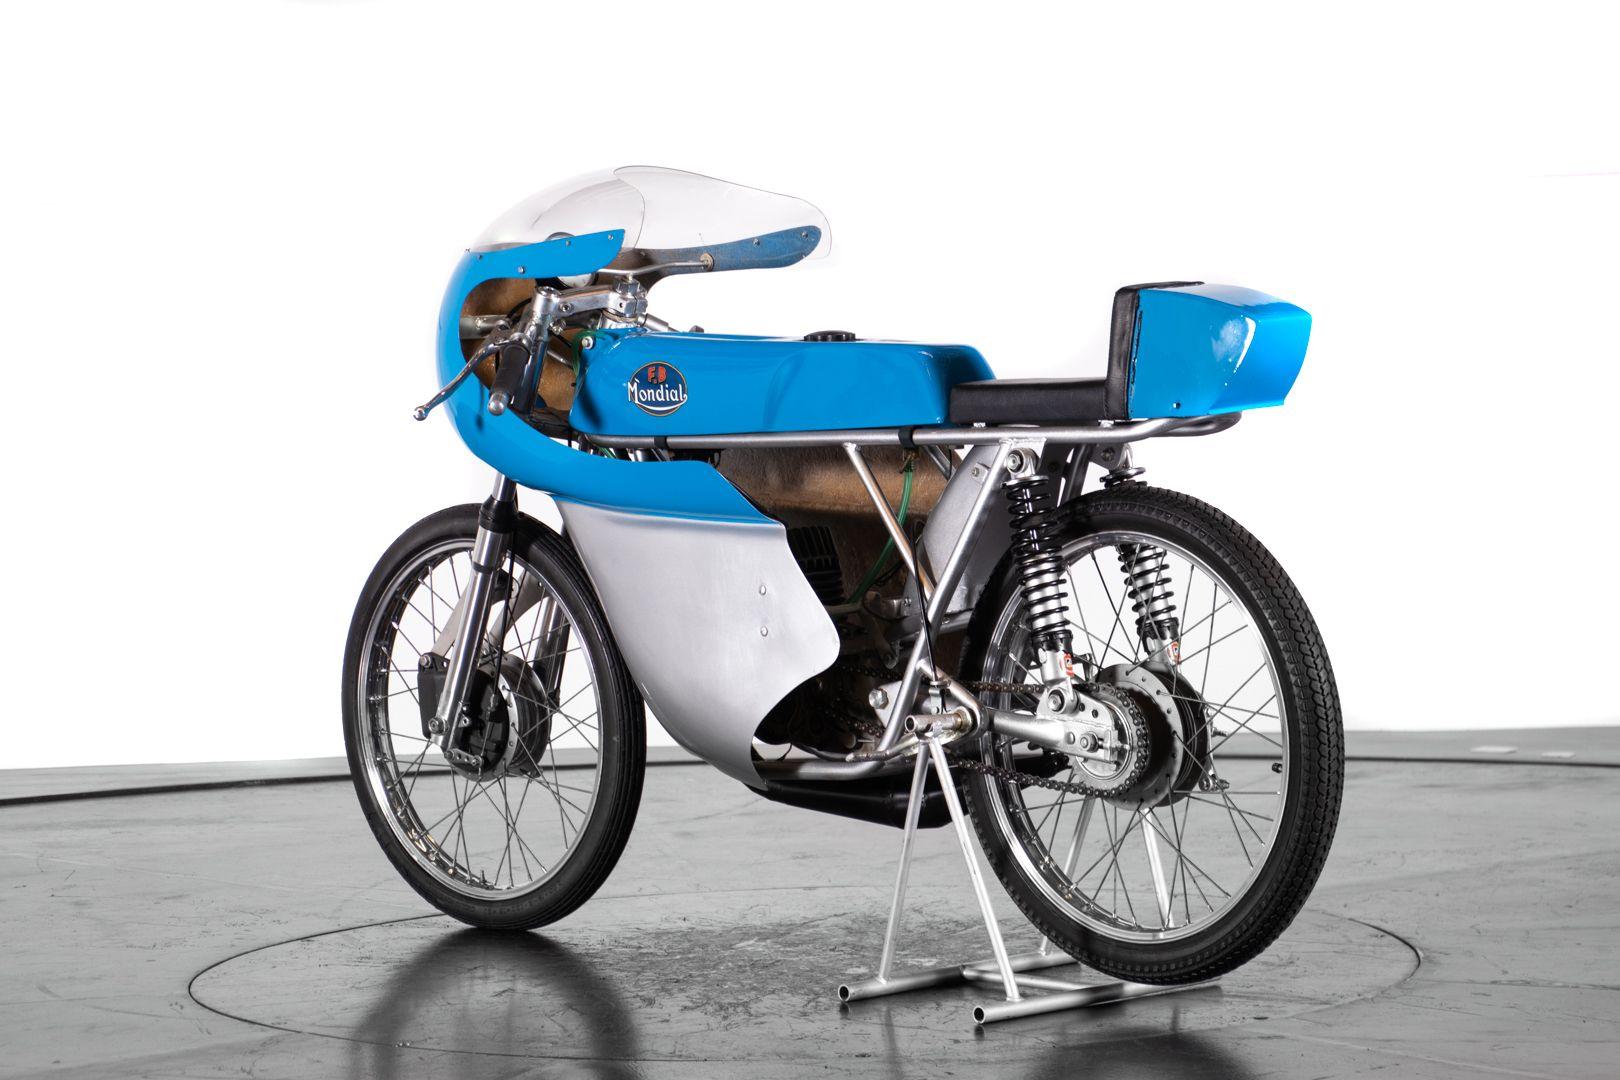 1968 MONDIAL CORSA UNICO ESEMPLARE 52051